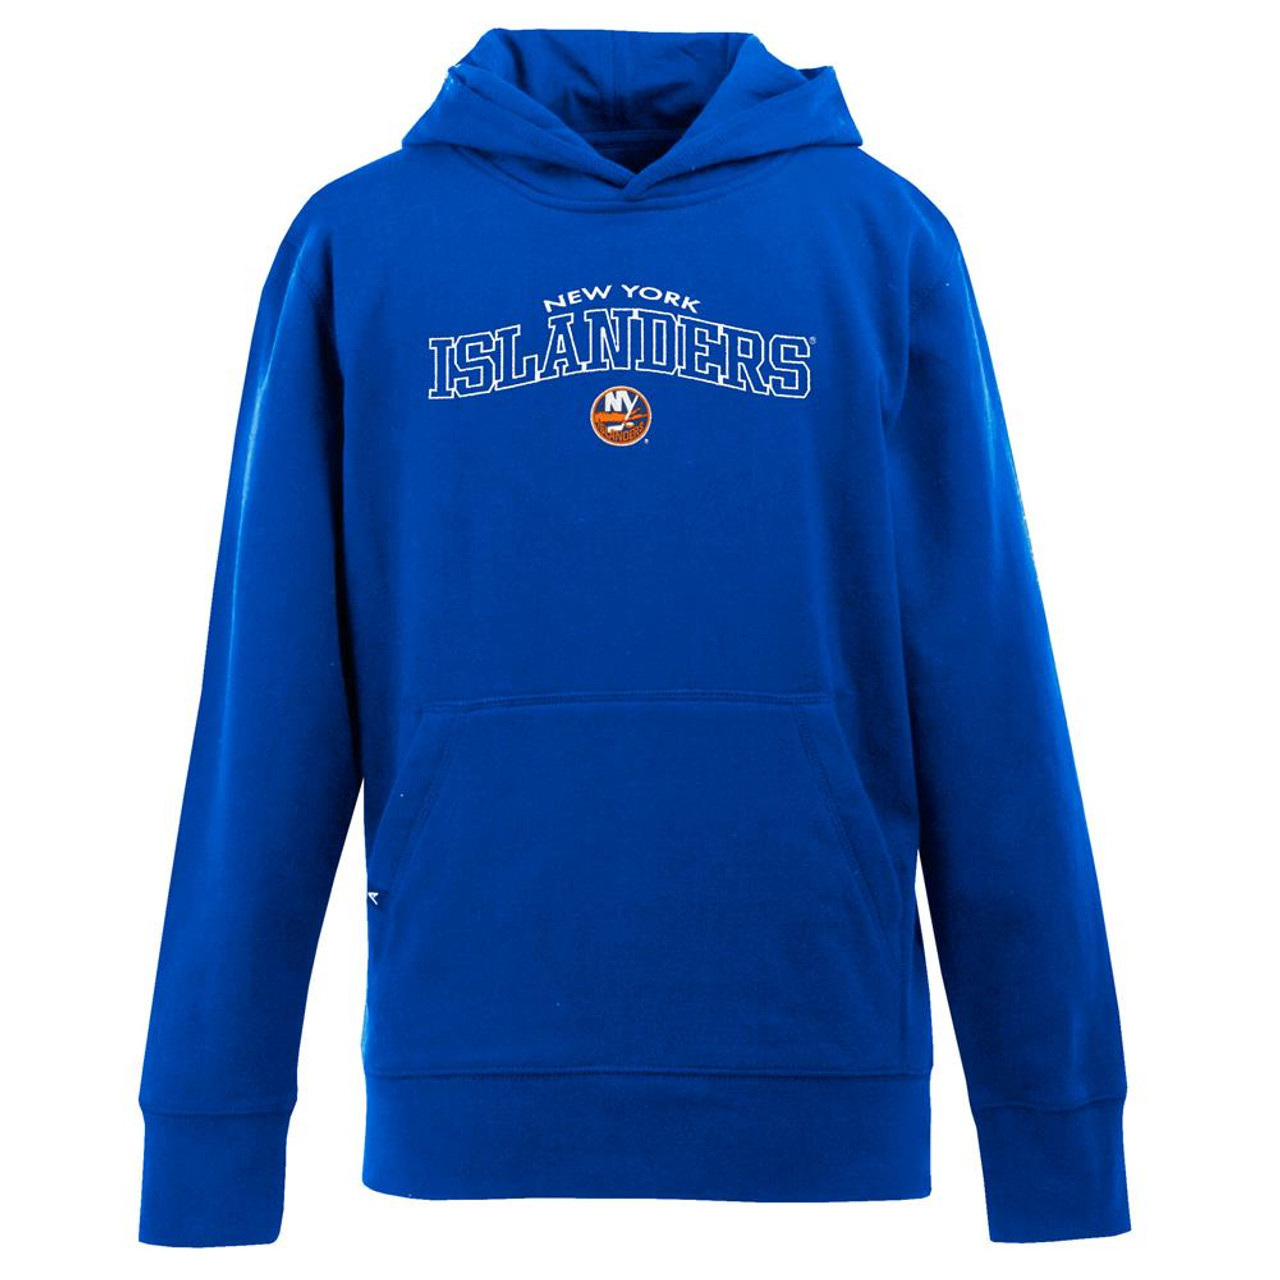 New York Islanders NY Youth Hoodie